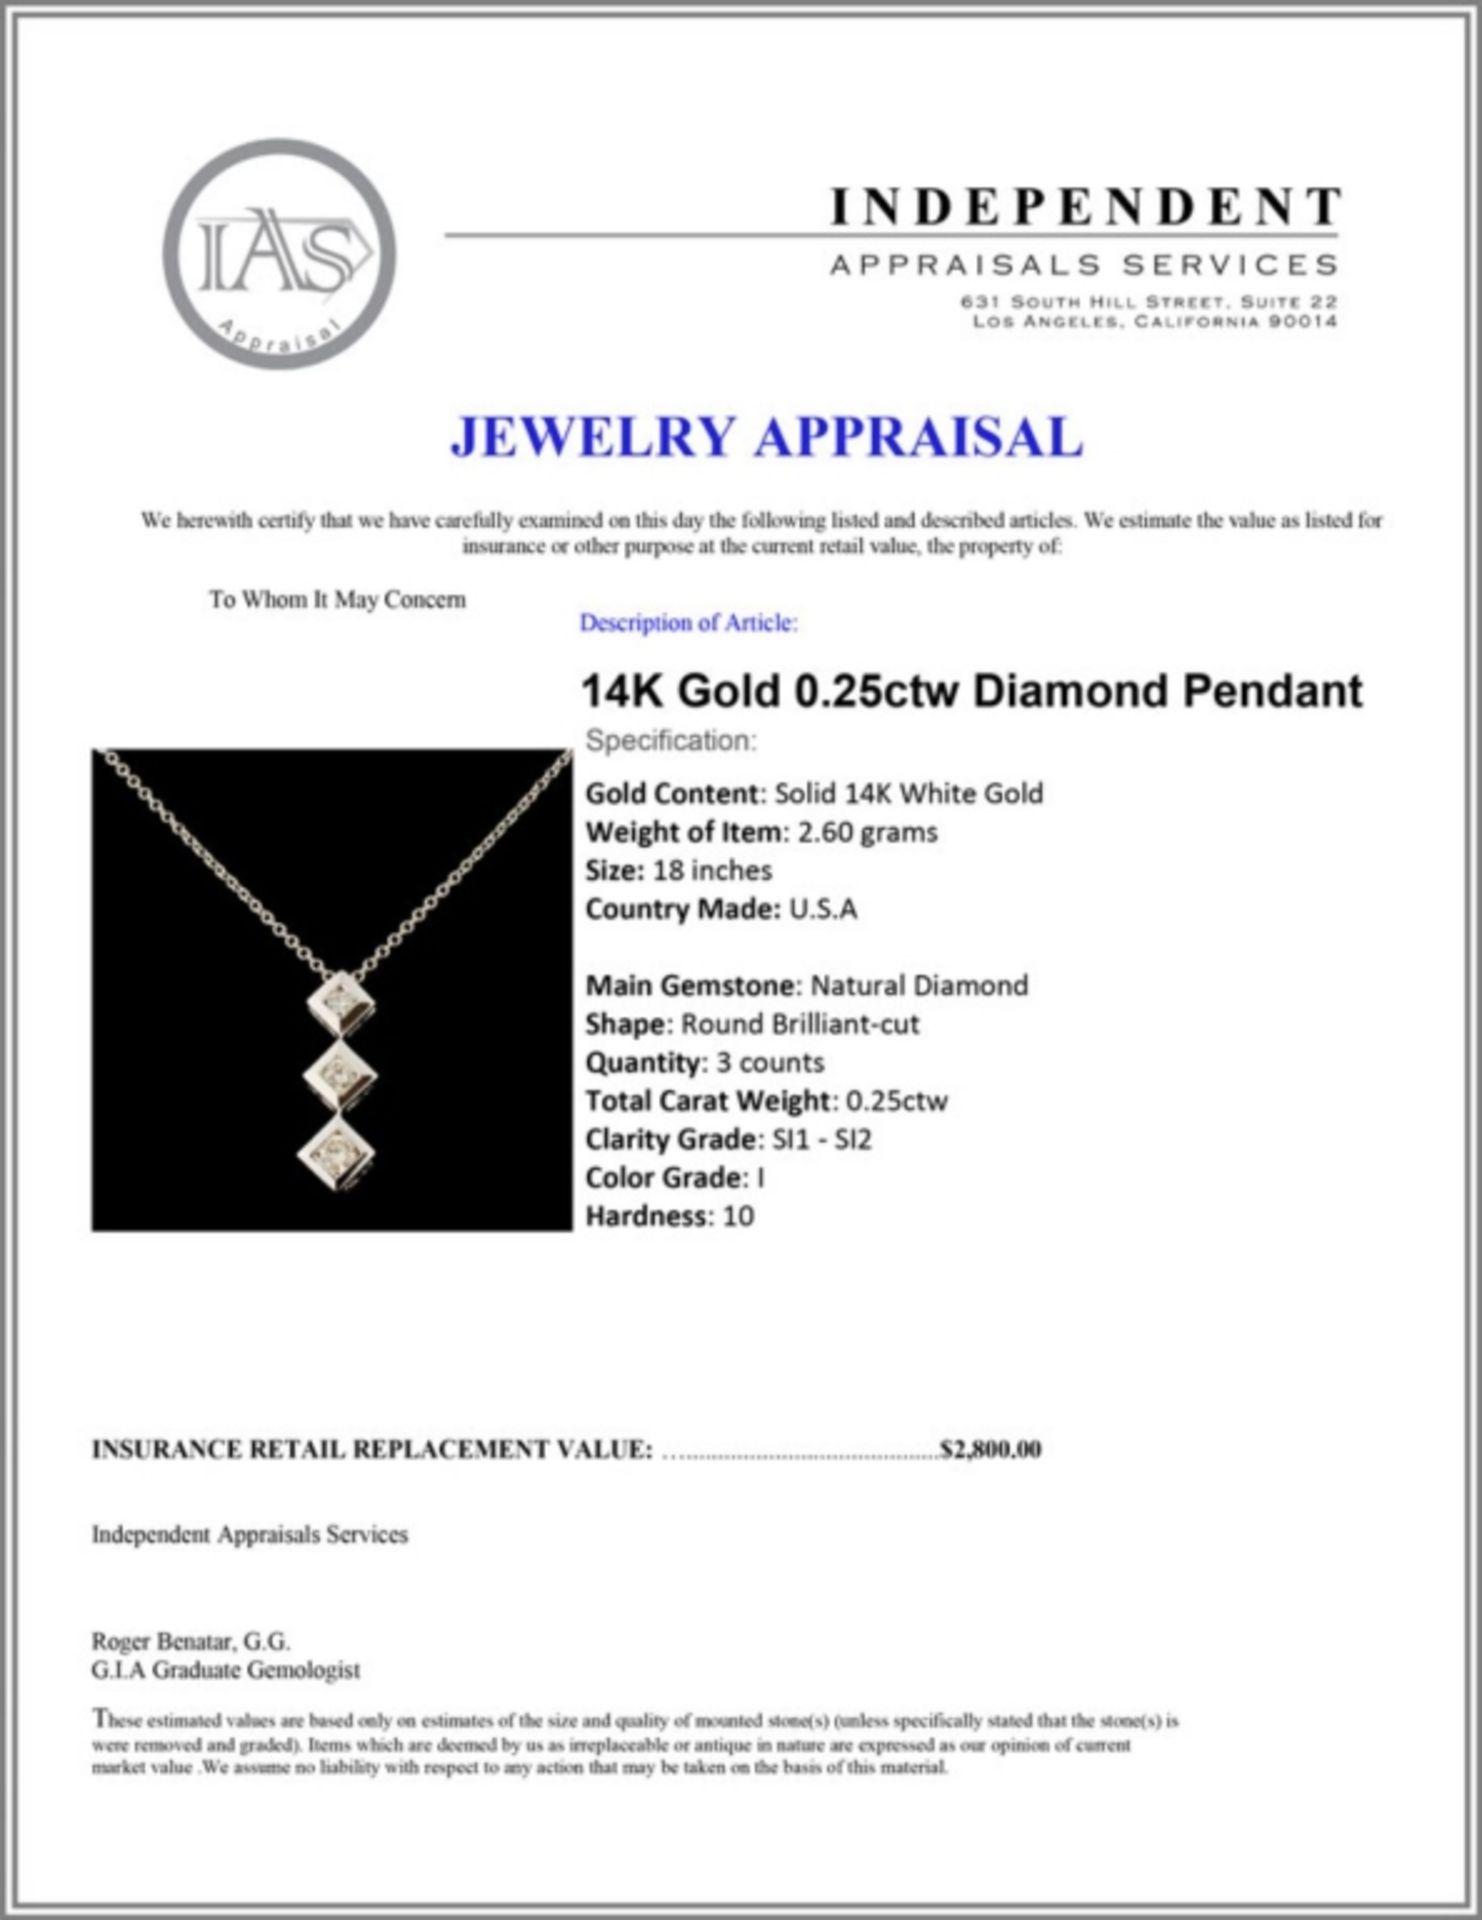 14K Gold 0.25ctw Diamond Pendant - Image 4 of 4